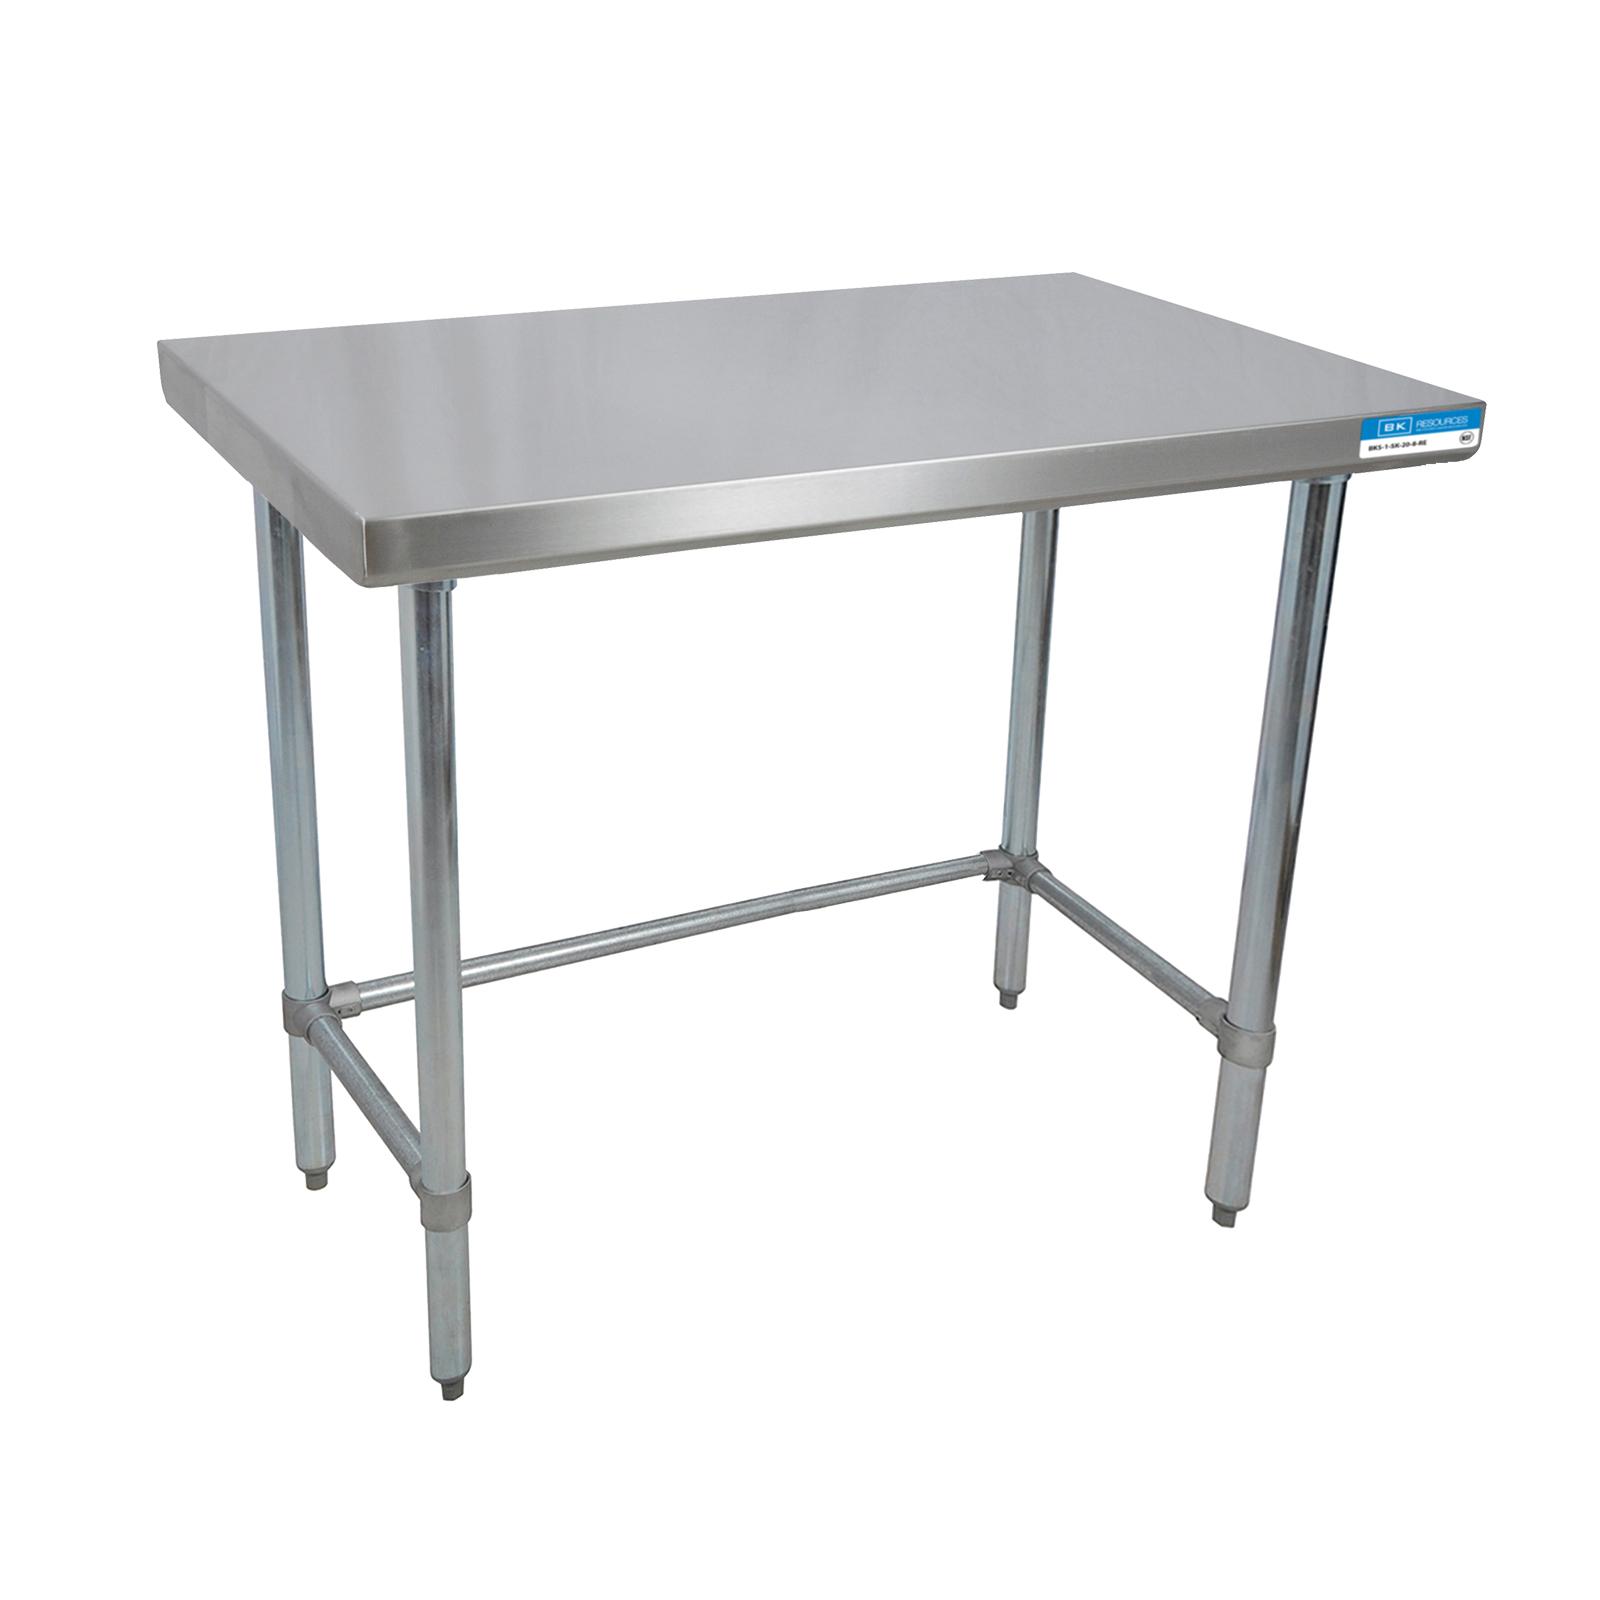 BK Resources SVTOB-3030 work table,  30